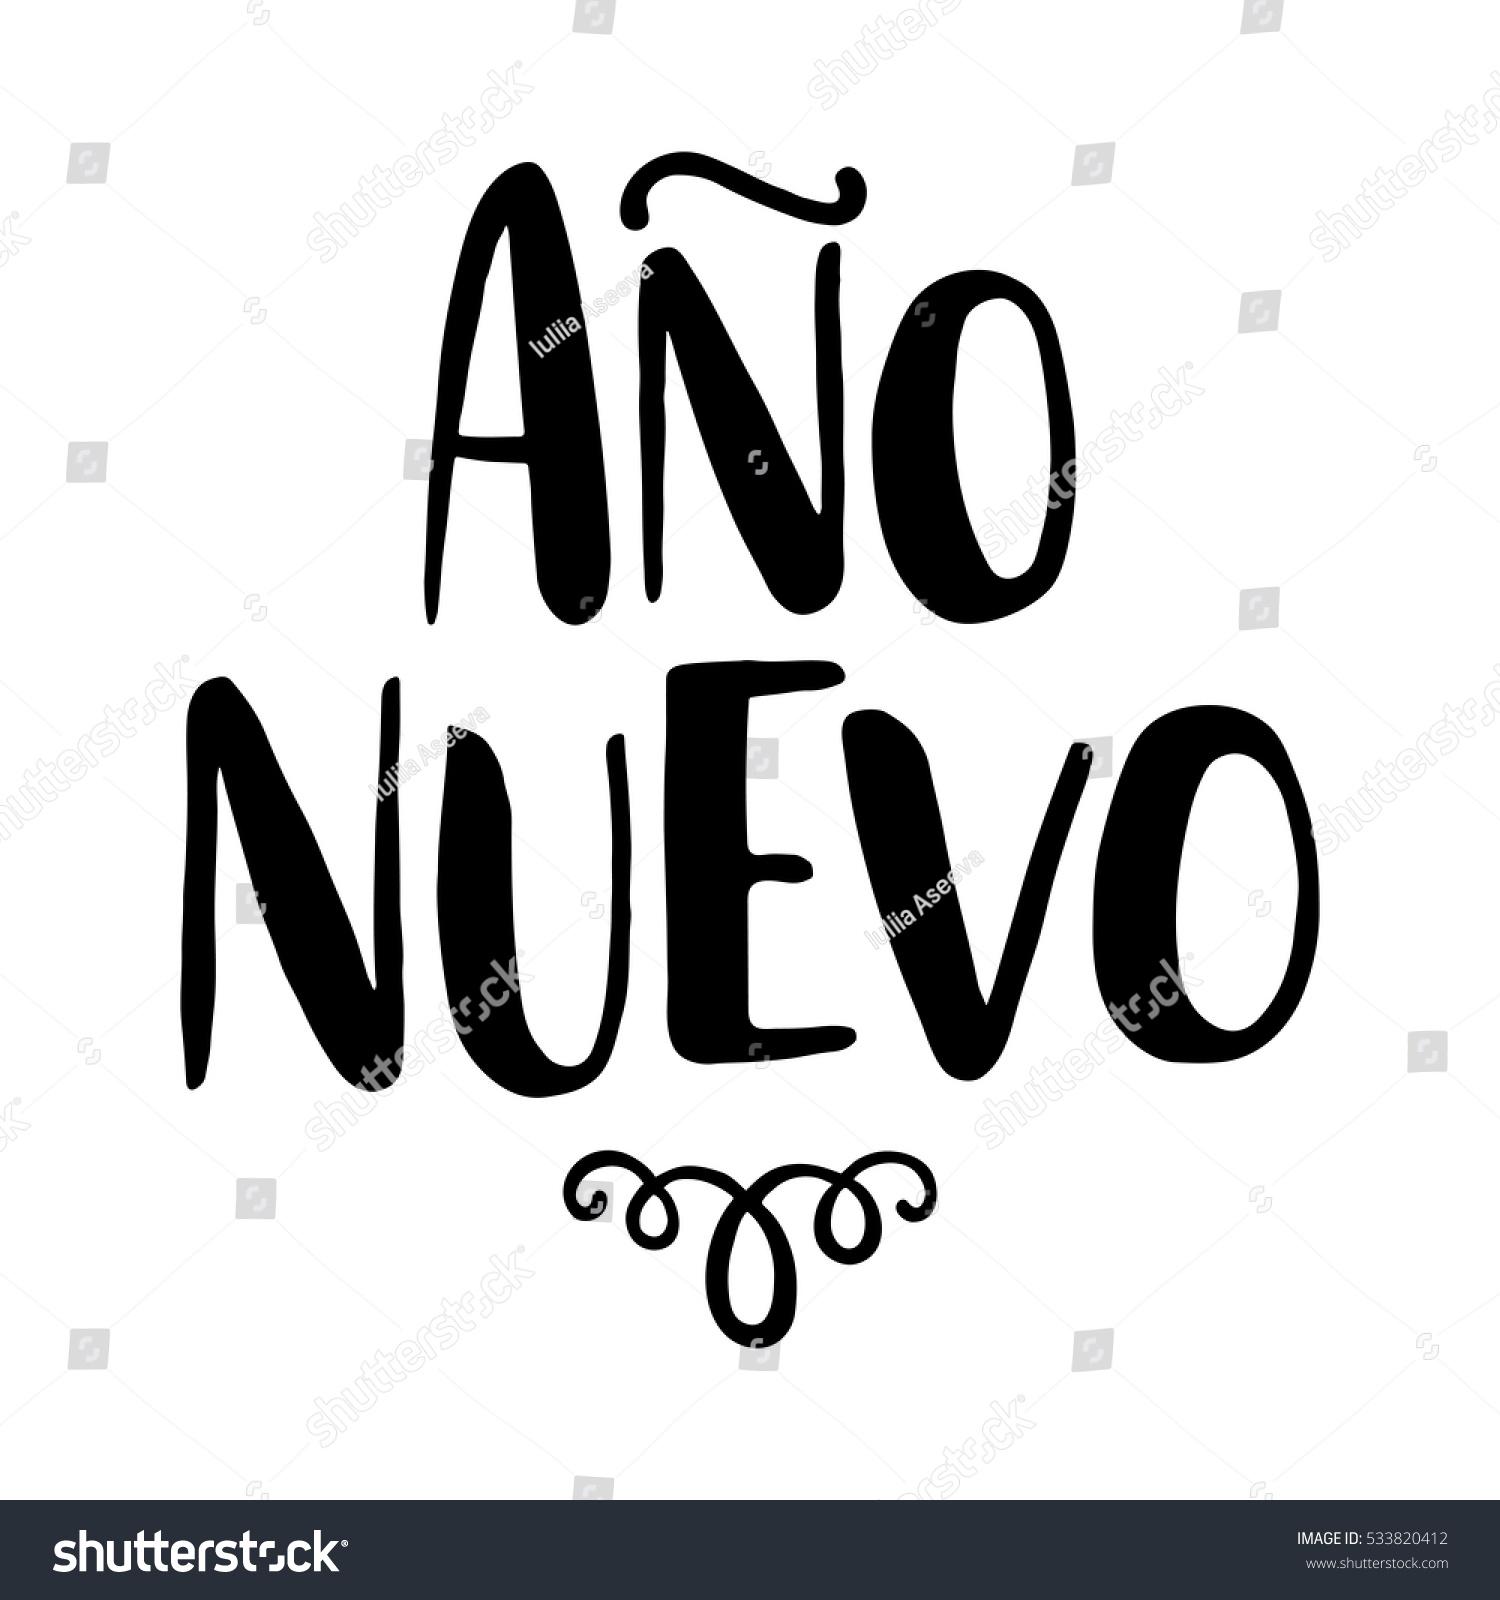 Ano nuevo. Happy New Year greeting in Spanish. Christmas holidays ...